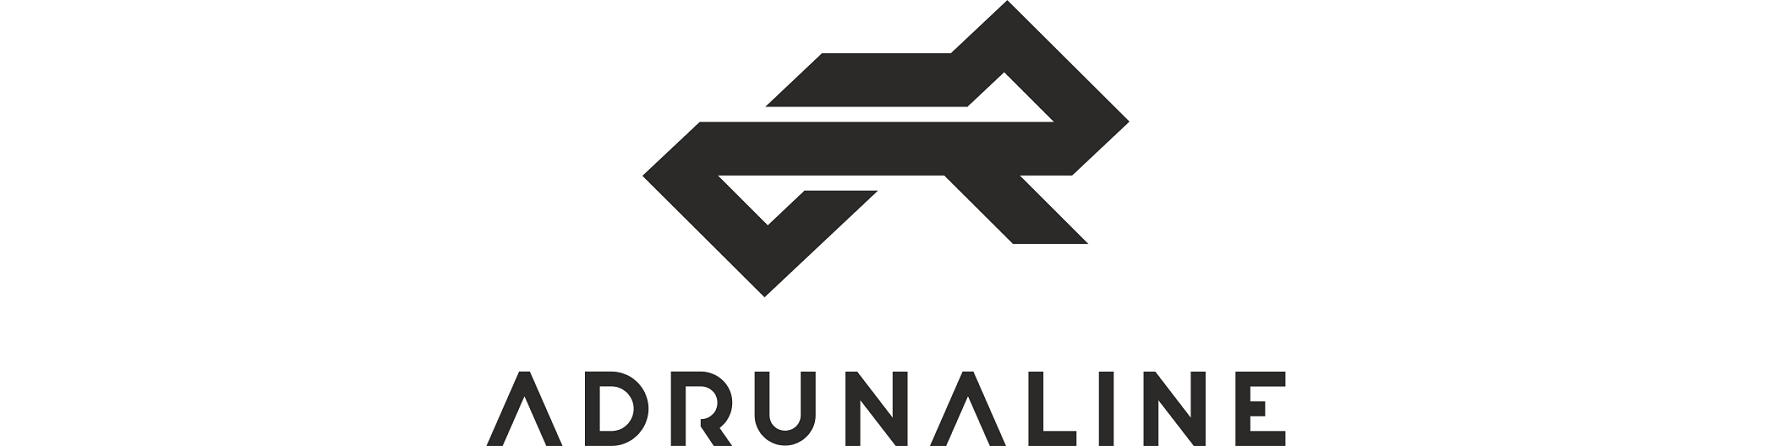 adrunaline logo sponsor